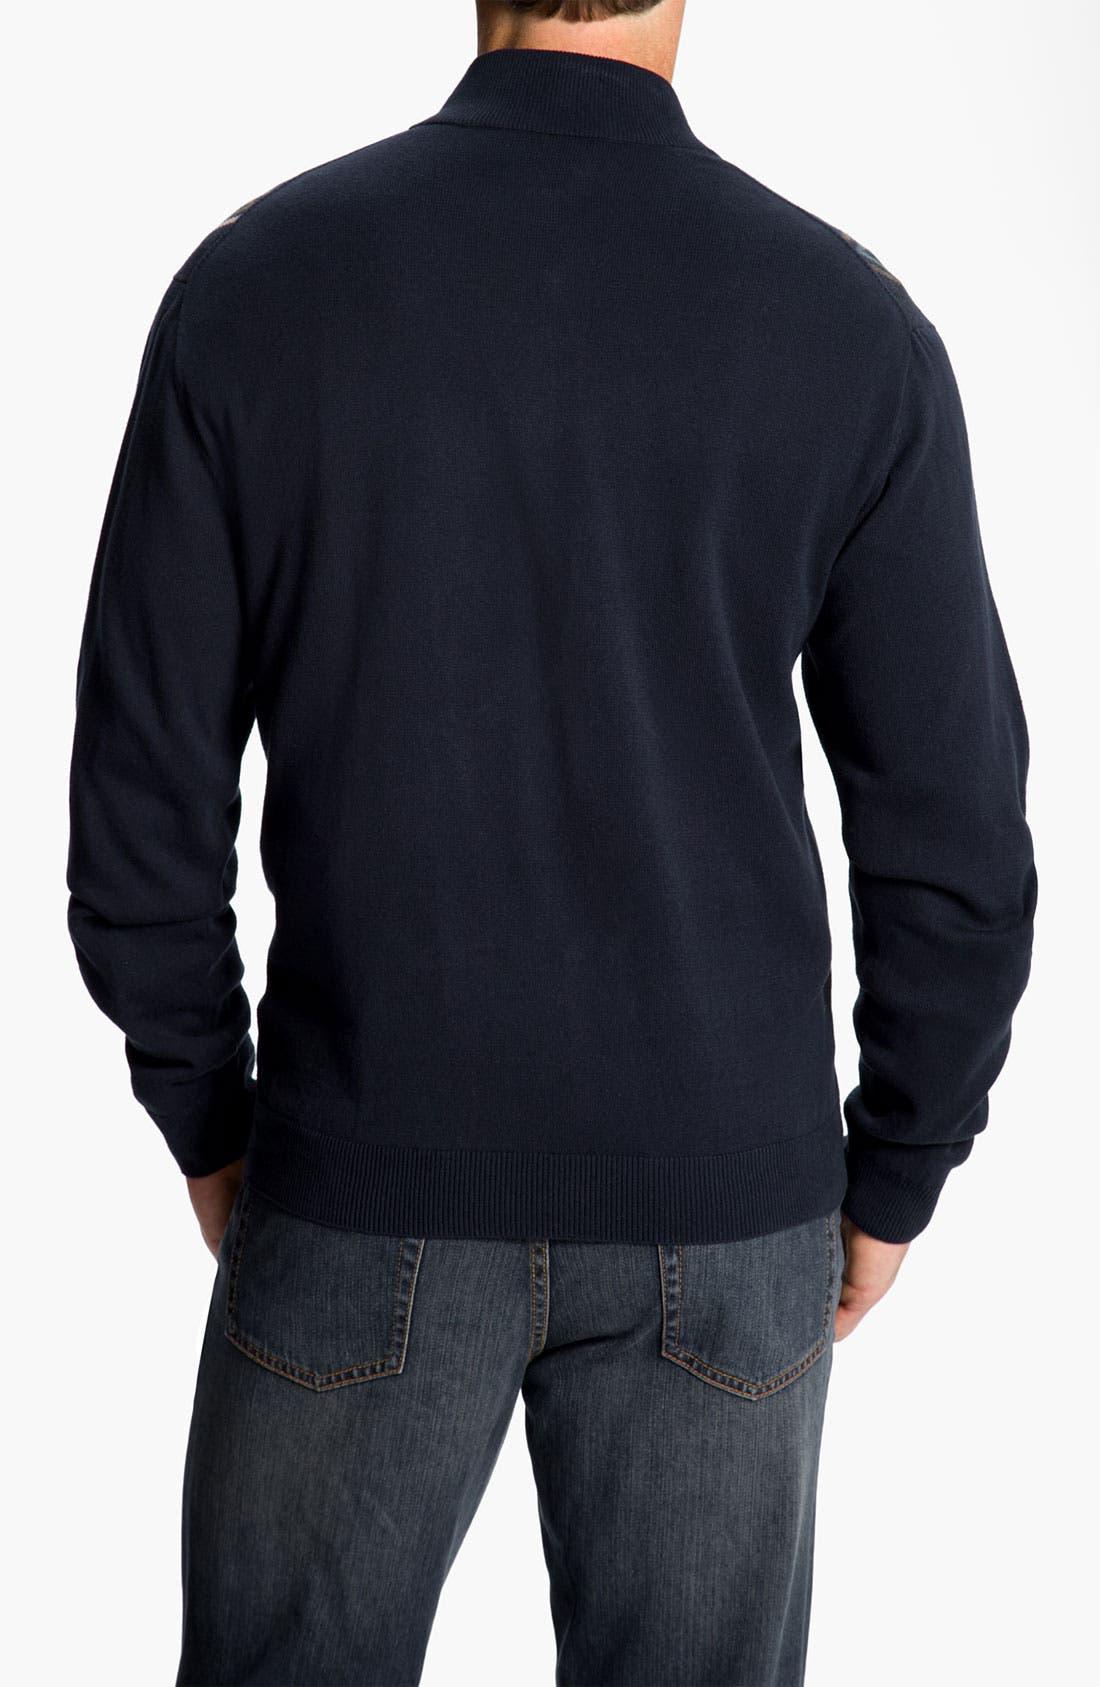 Alternate Image 2  - Cutter & Buck 'Gorge' Half Zip Sweater (Big & Tall) (Online Exclusive)